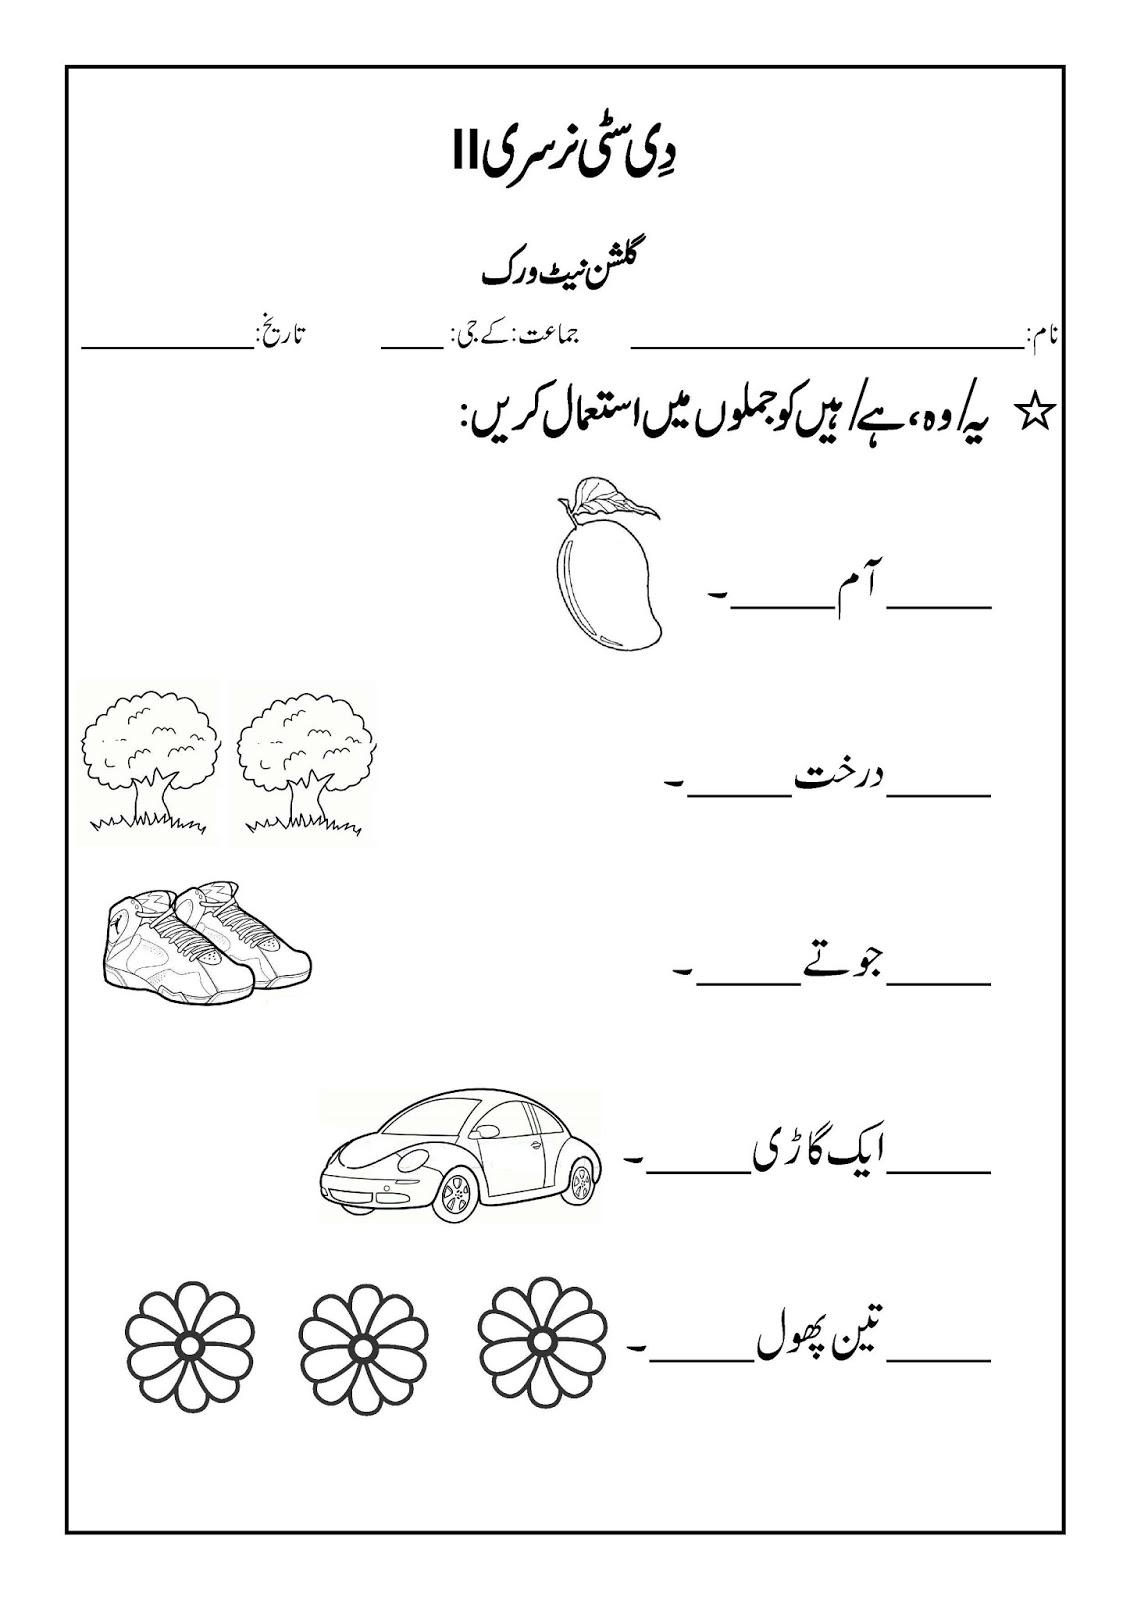 medium resolution of Worksheet For Class 2 Urdu   Printable Worksheets and Activities for  Teachers